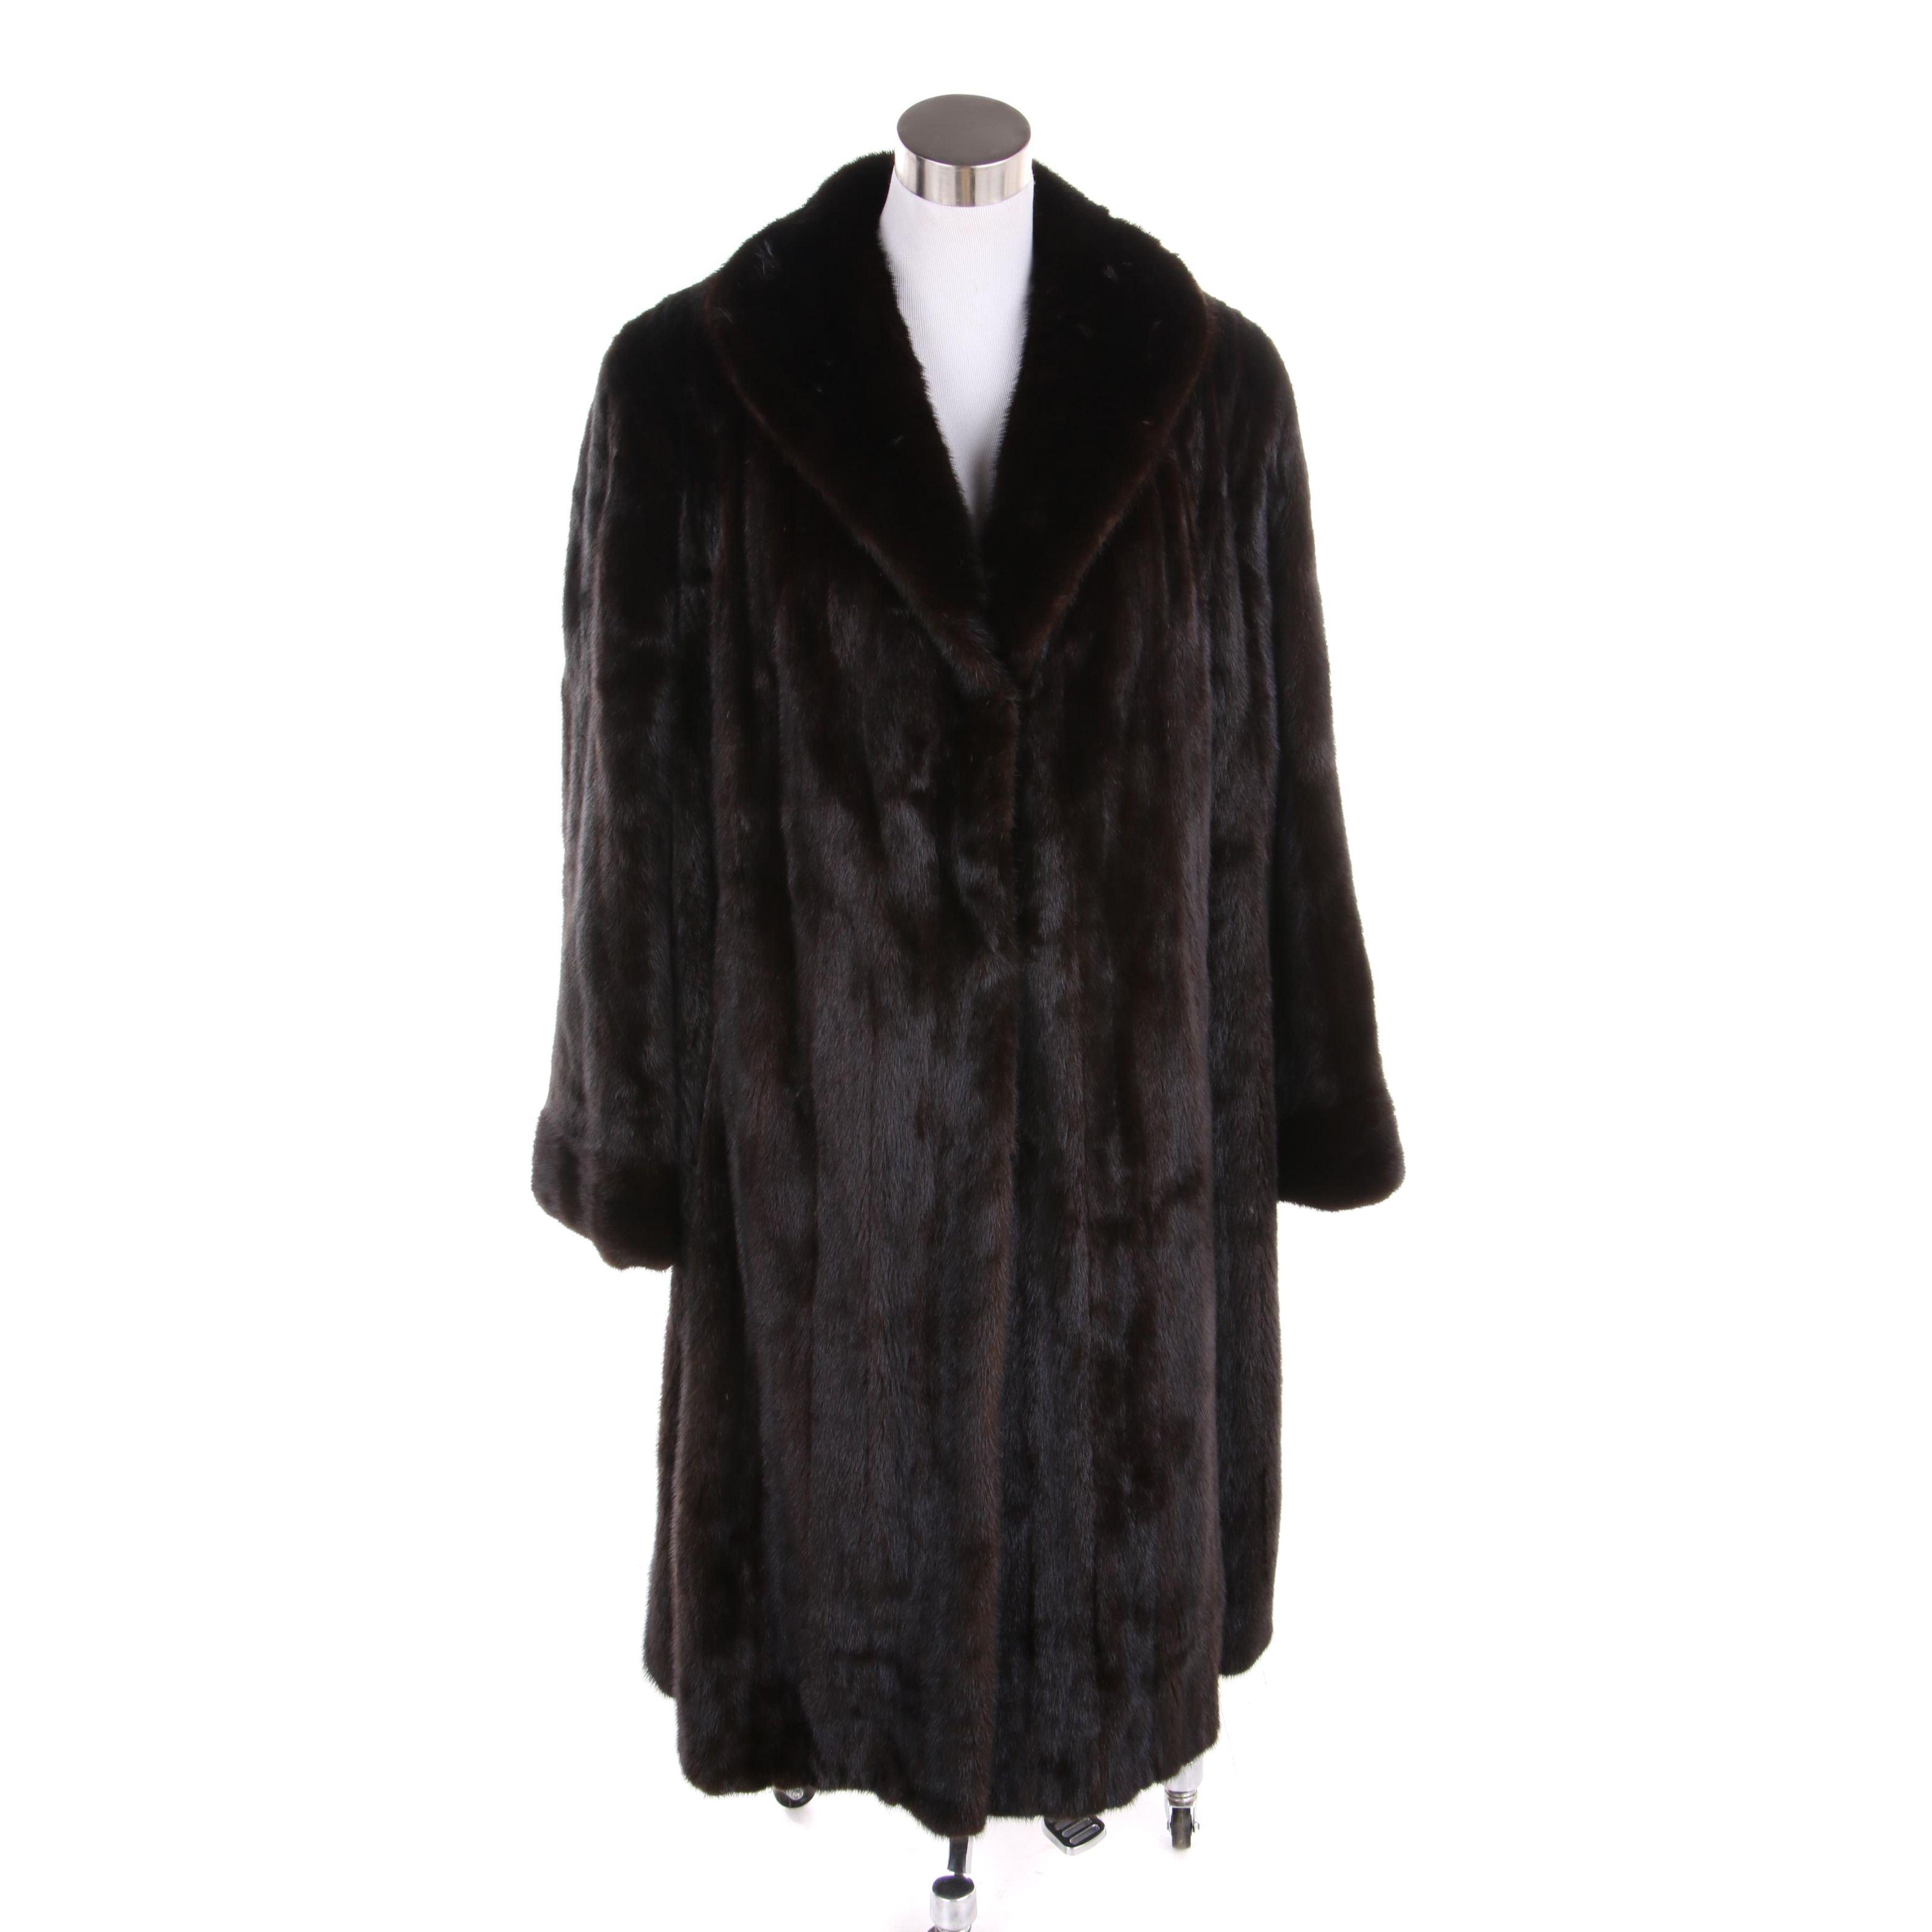 Women's Dark Mahogany Mink Fur Coat with Rabbit Fur Lined Leather Gloves